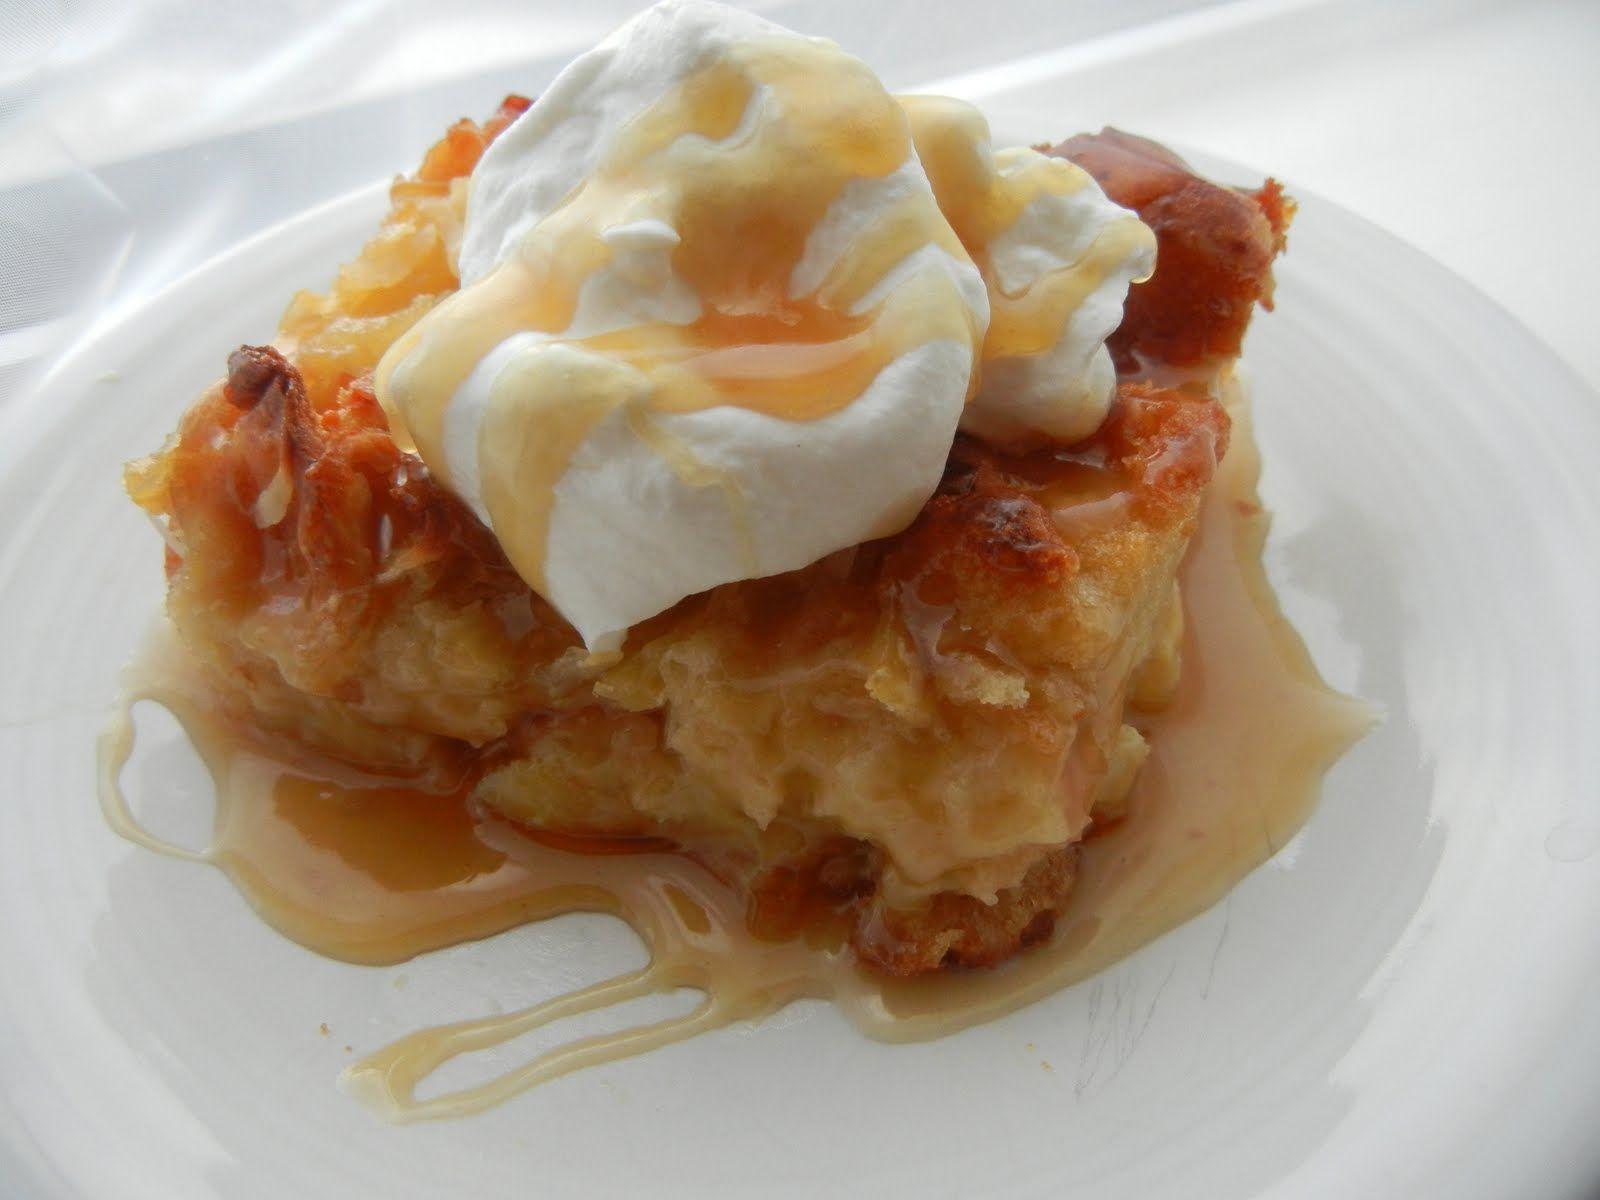 Carol Ann's Pineapple Bread Pudding